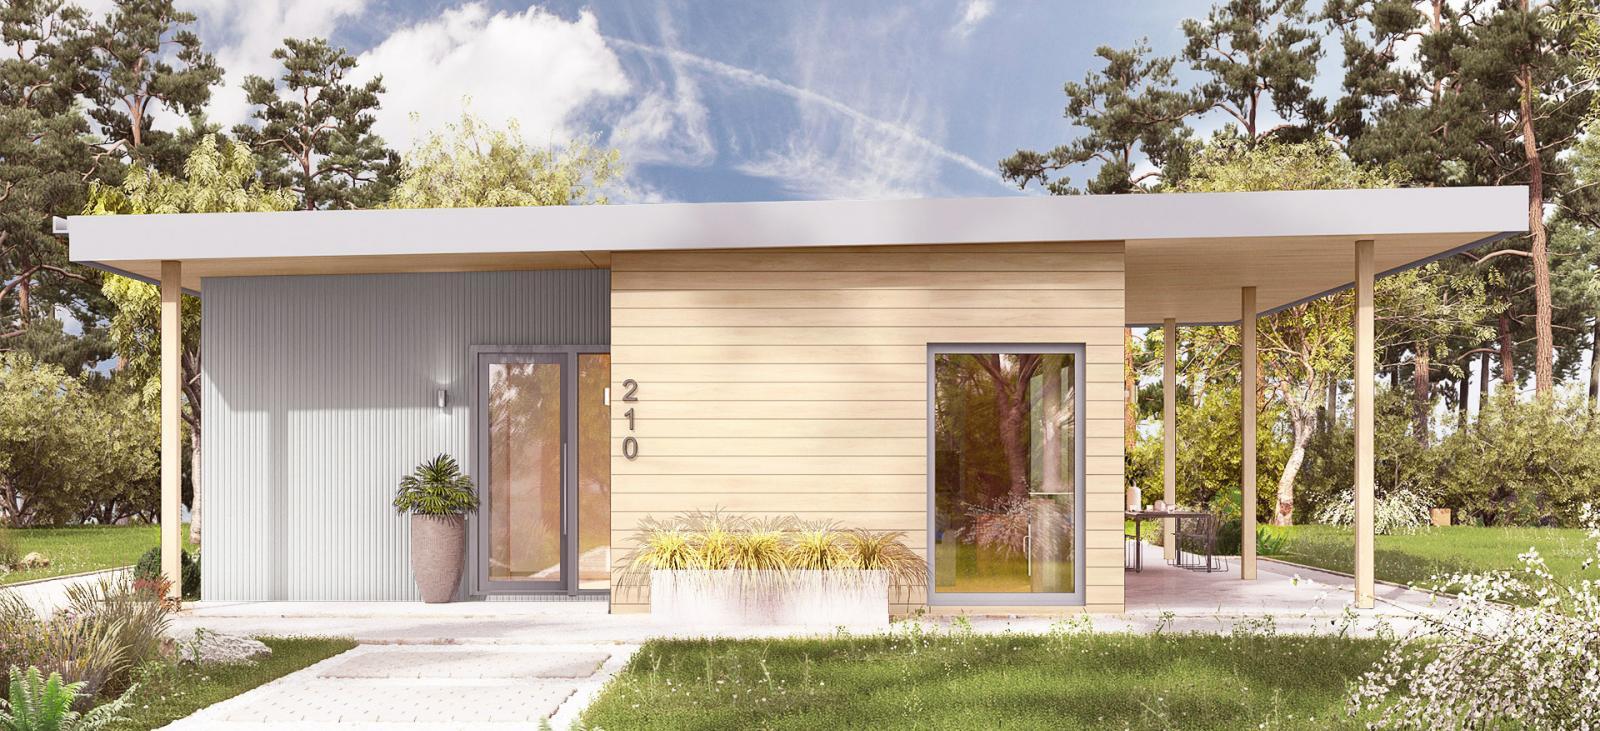 Dvele modern prefab homes and ADUs.